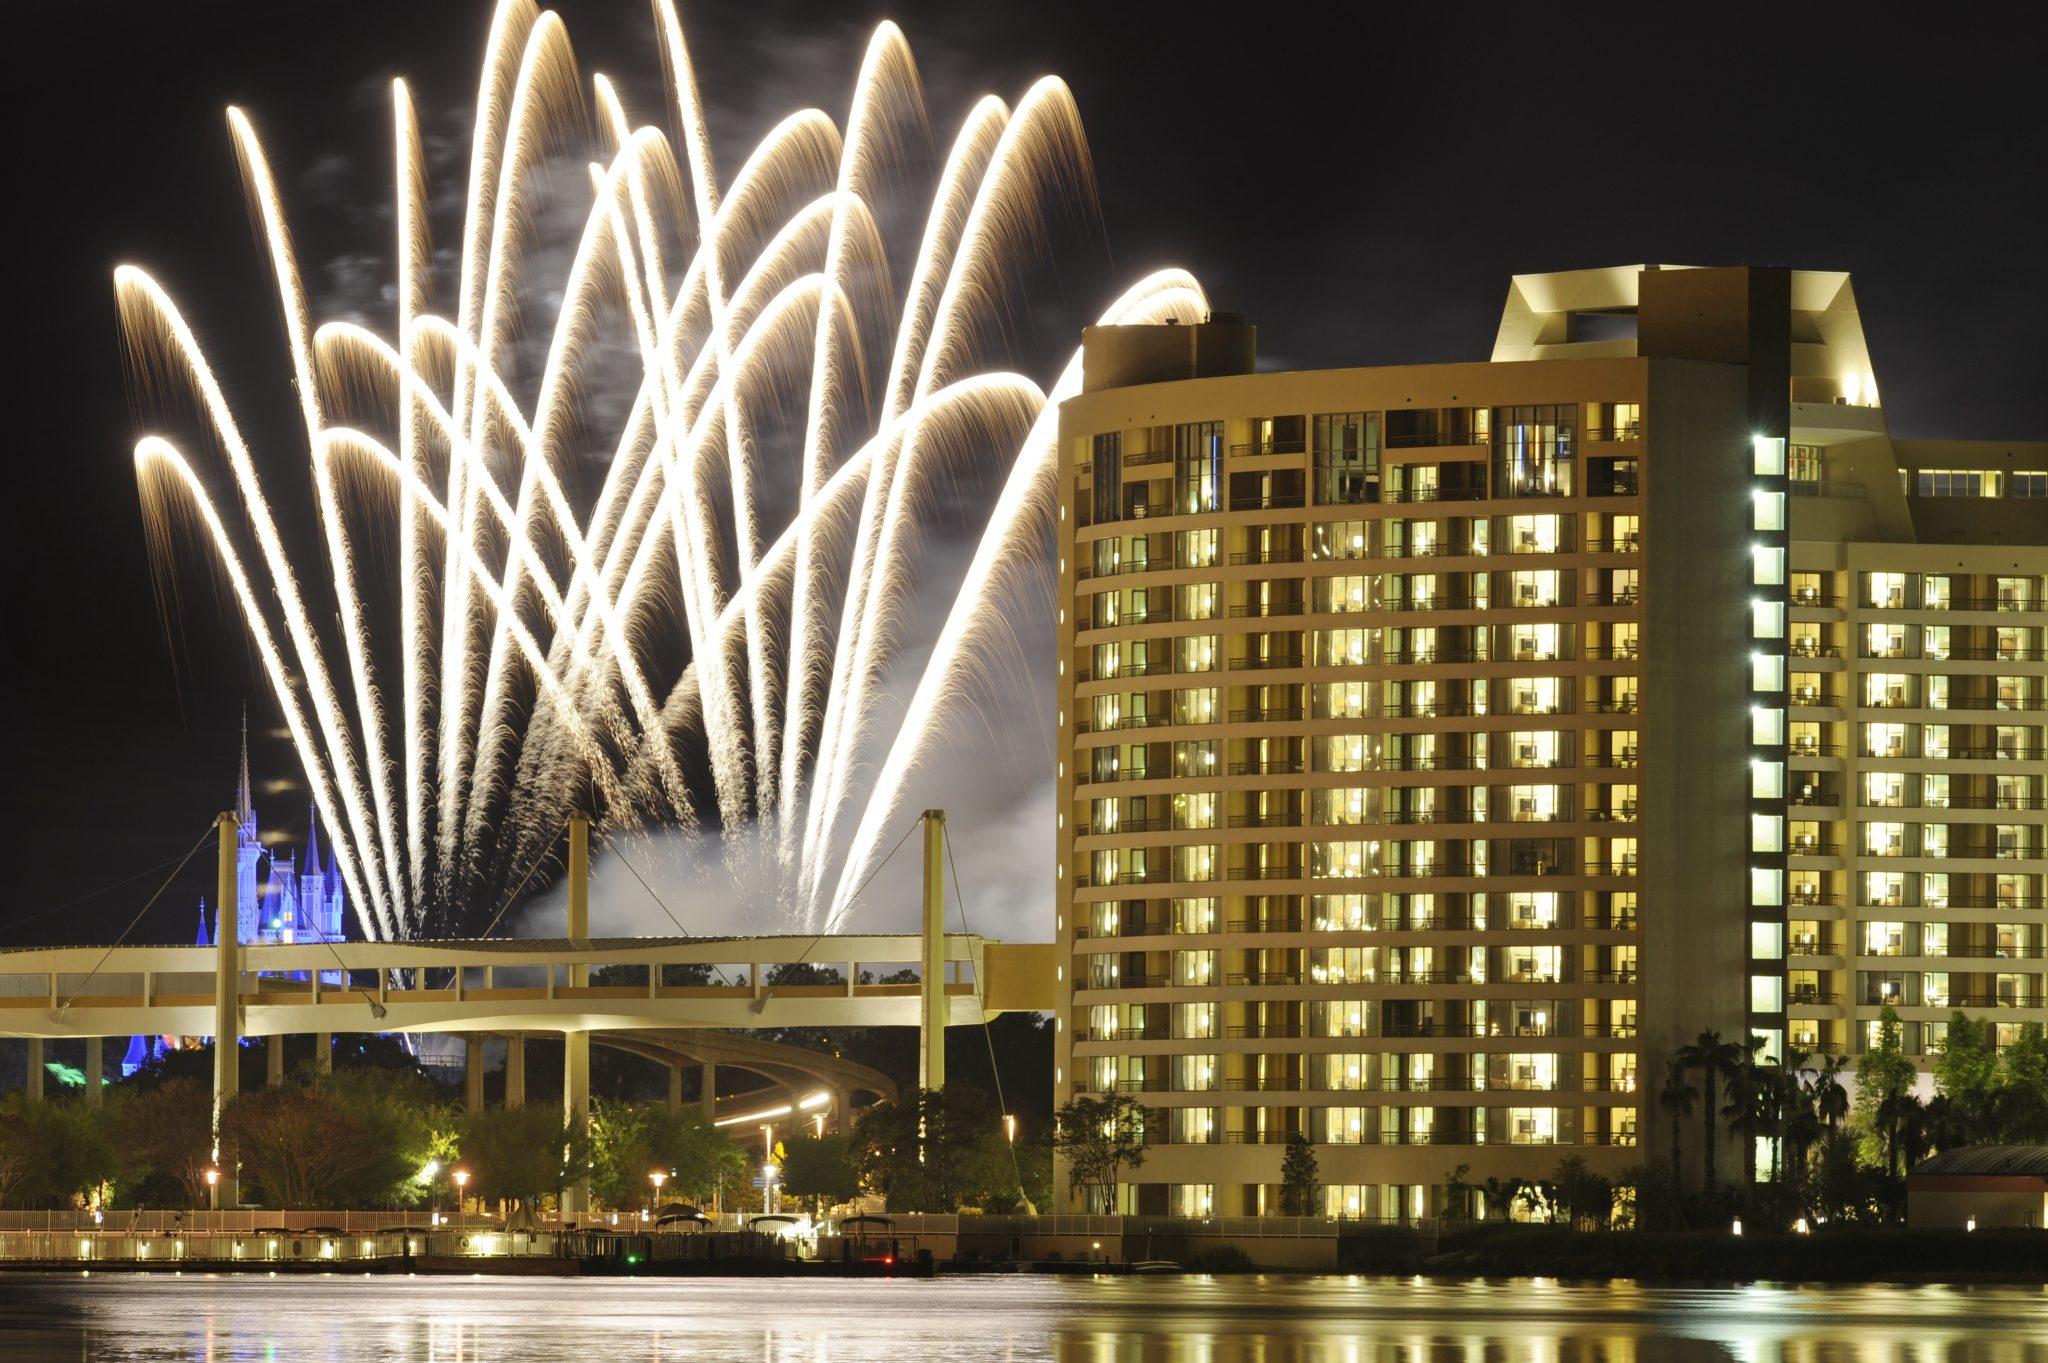 ResortLoop.com Episode 442 – #OneTip For Choosing A Resort!